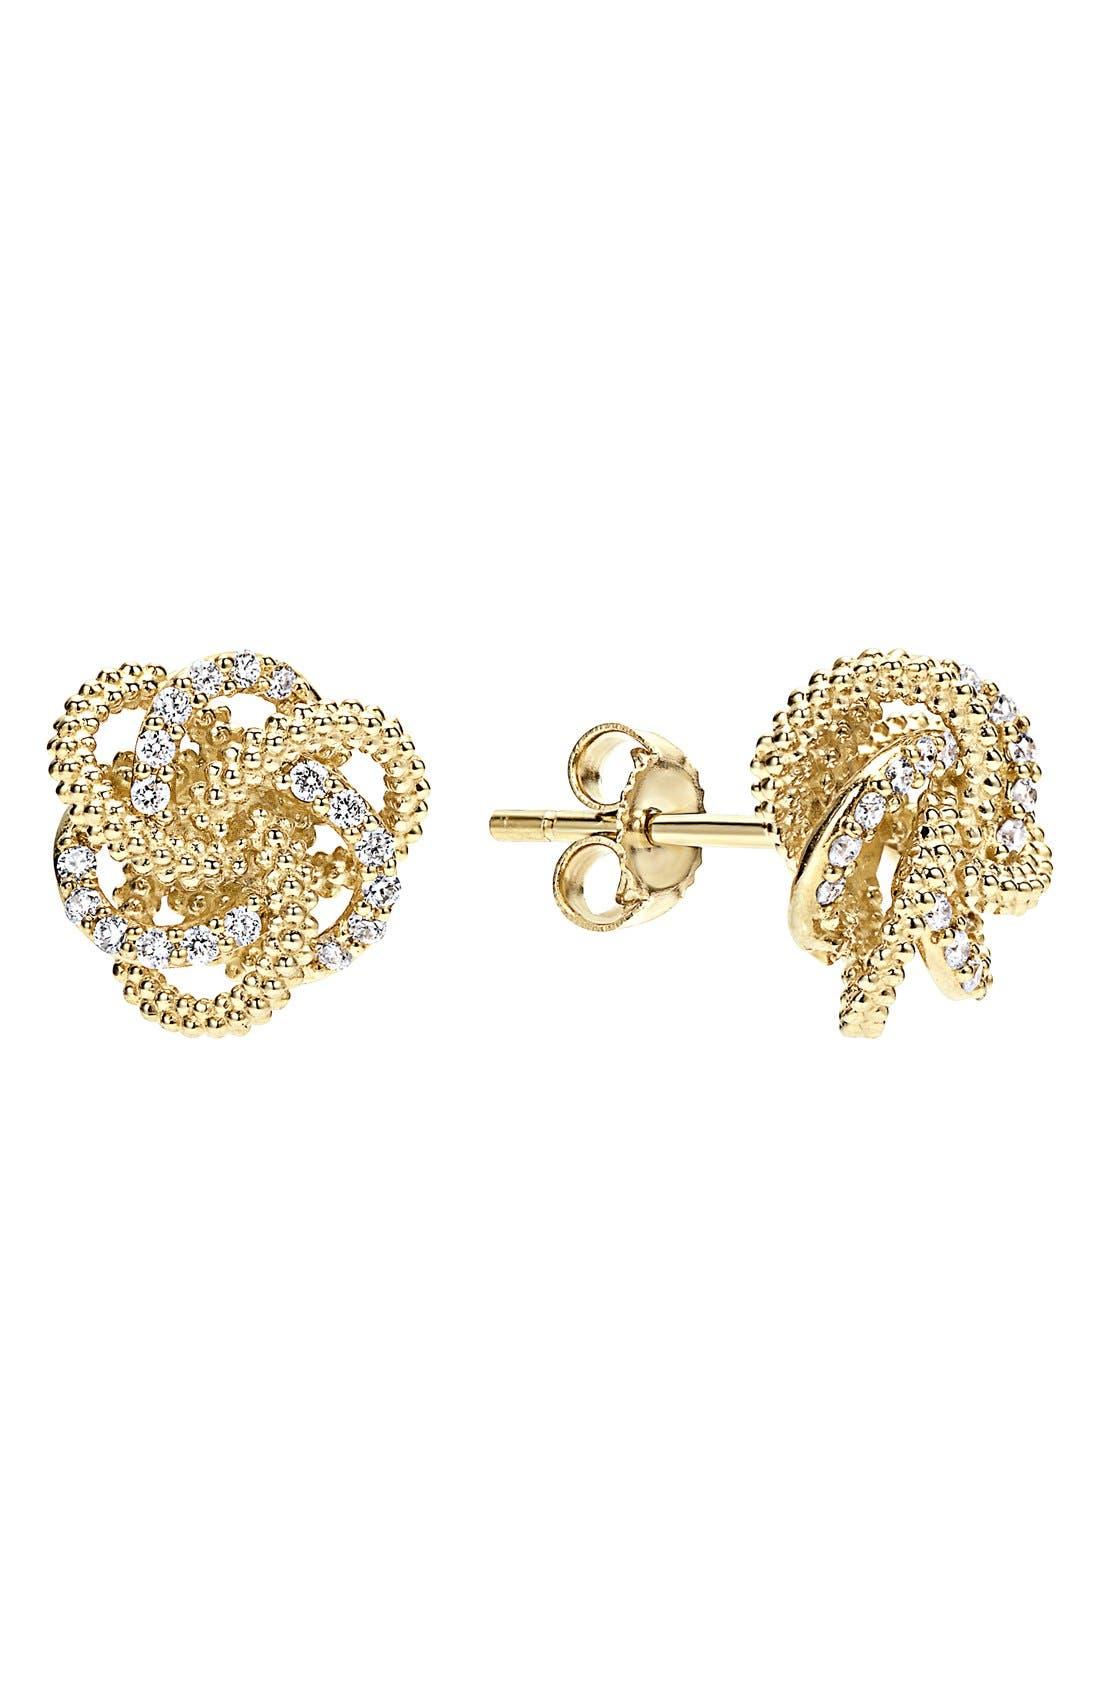 'Love Knot' Diamond Stud Earrings,                             Main thumbnail 1, color,                             Gold